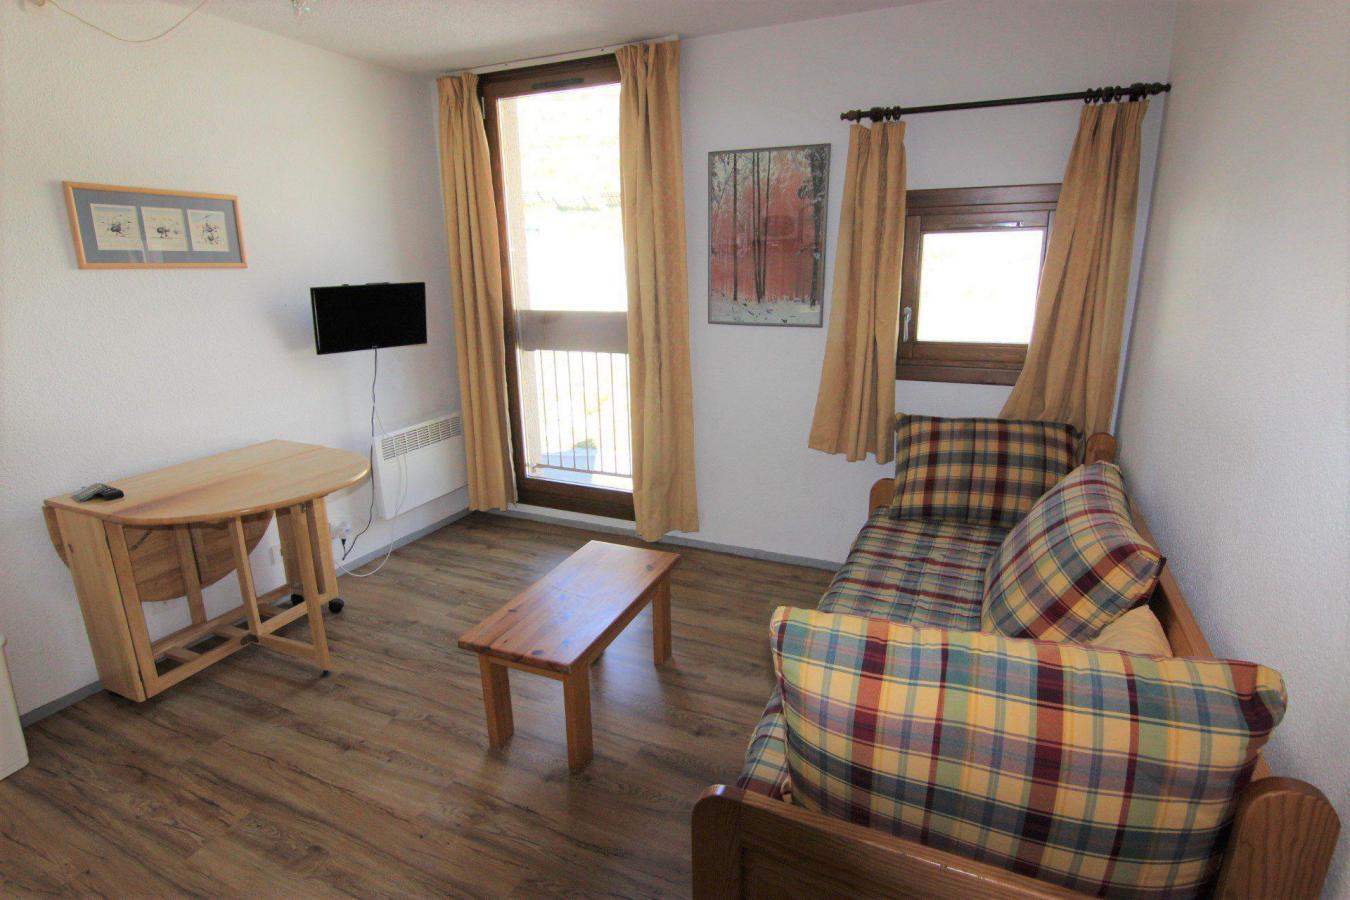 Location au ski Studio 2 personnes (126) - Residence Roche Blanche - Val Thorens - Salle de bains